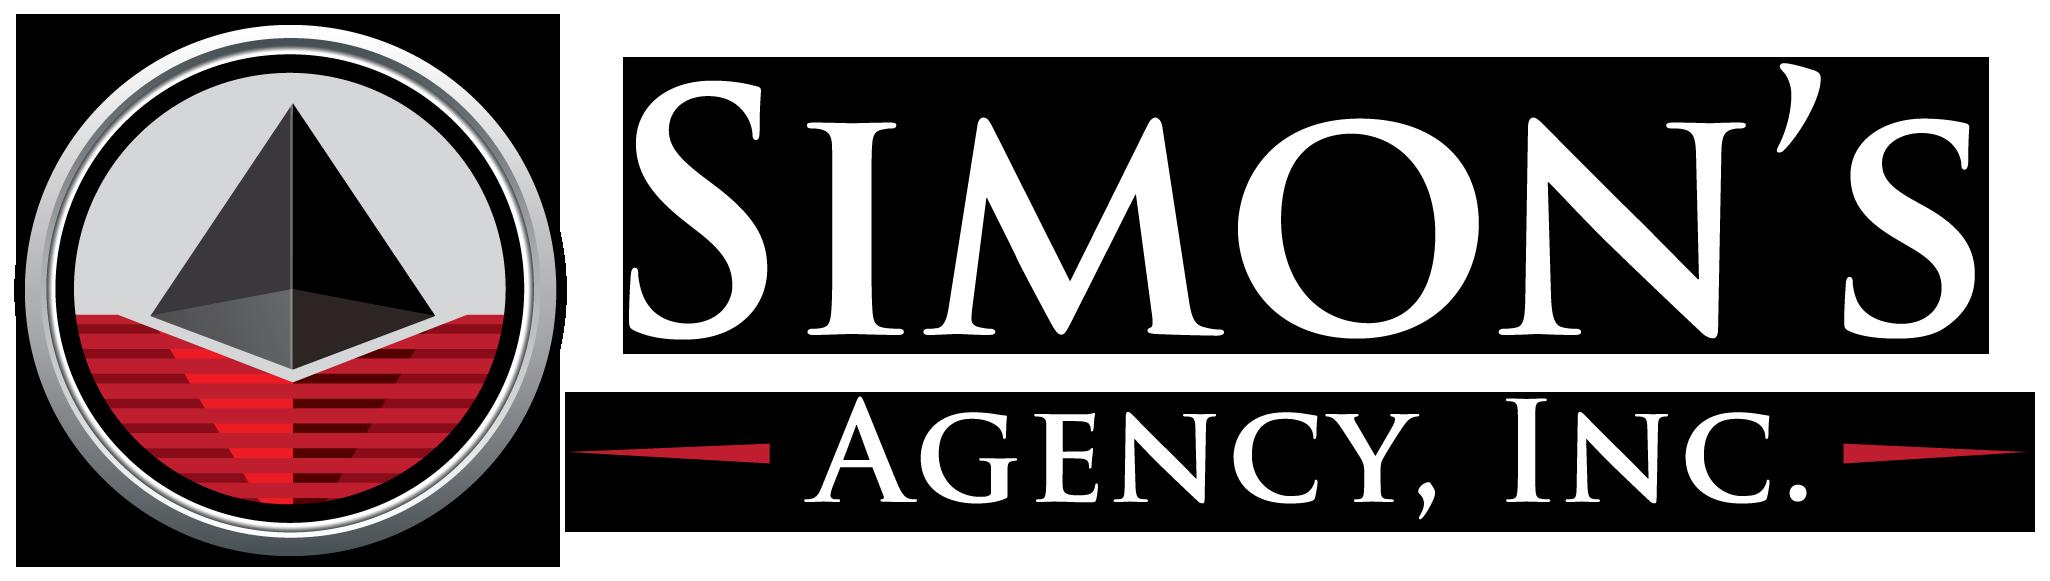 Simon's Agency, Inc.